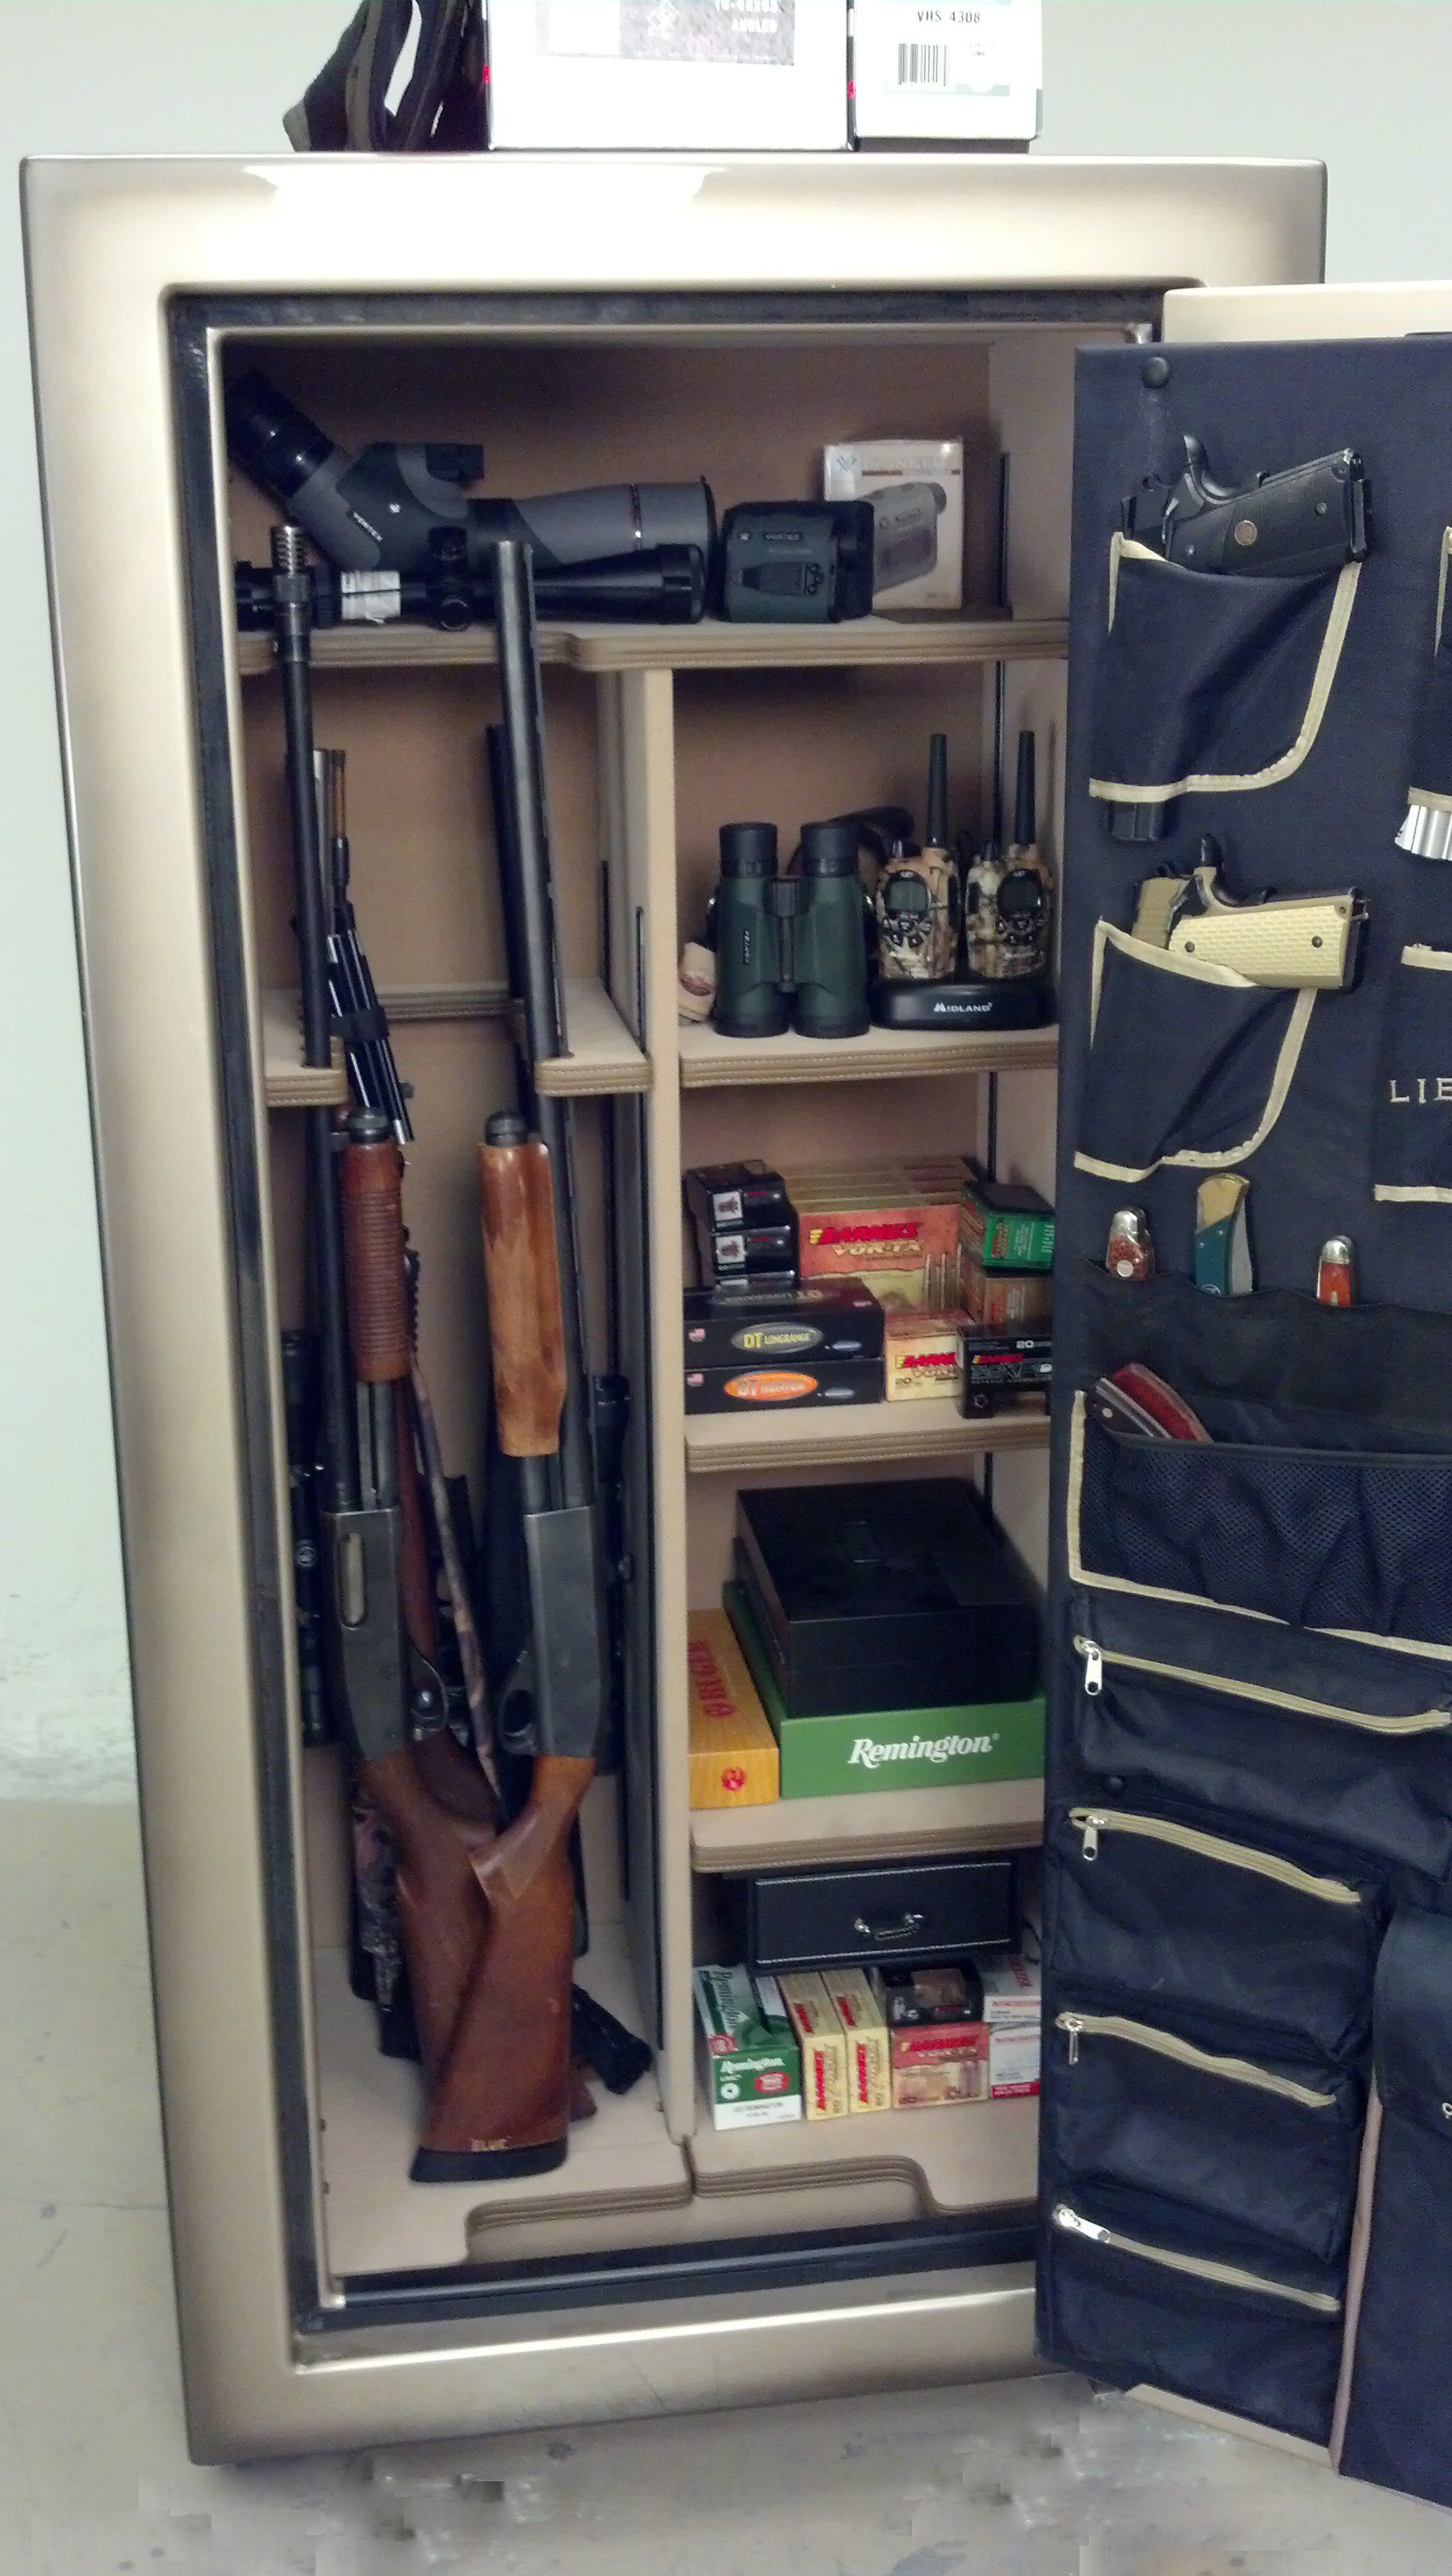 Liberty Safe Gun Safe Hunting gear Vortex optics Midland Radios